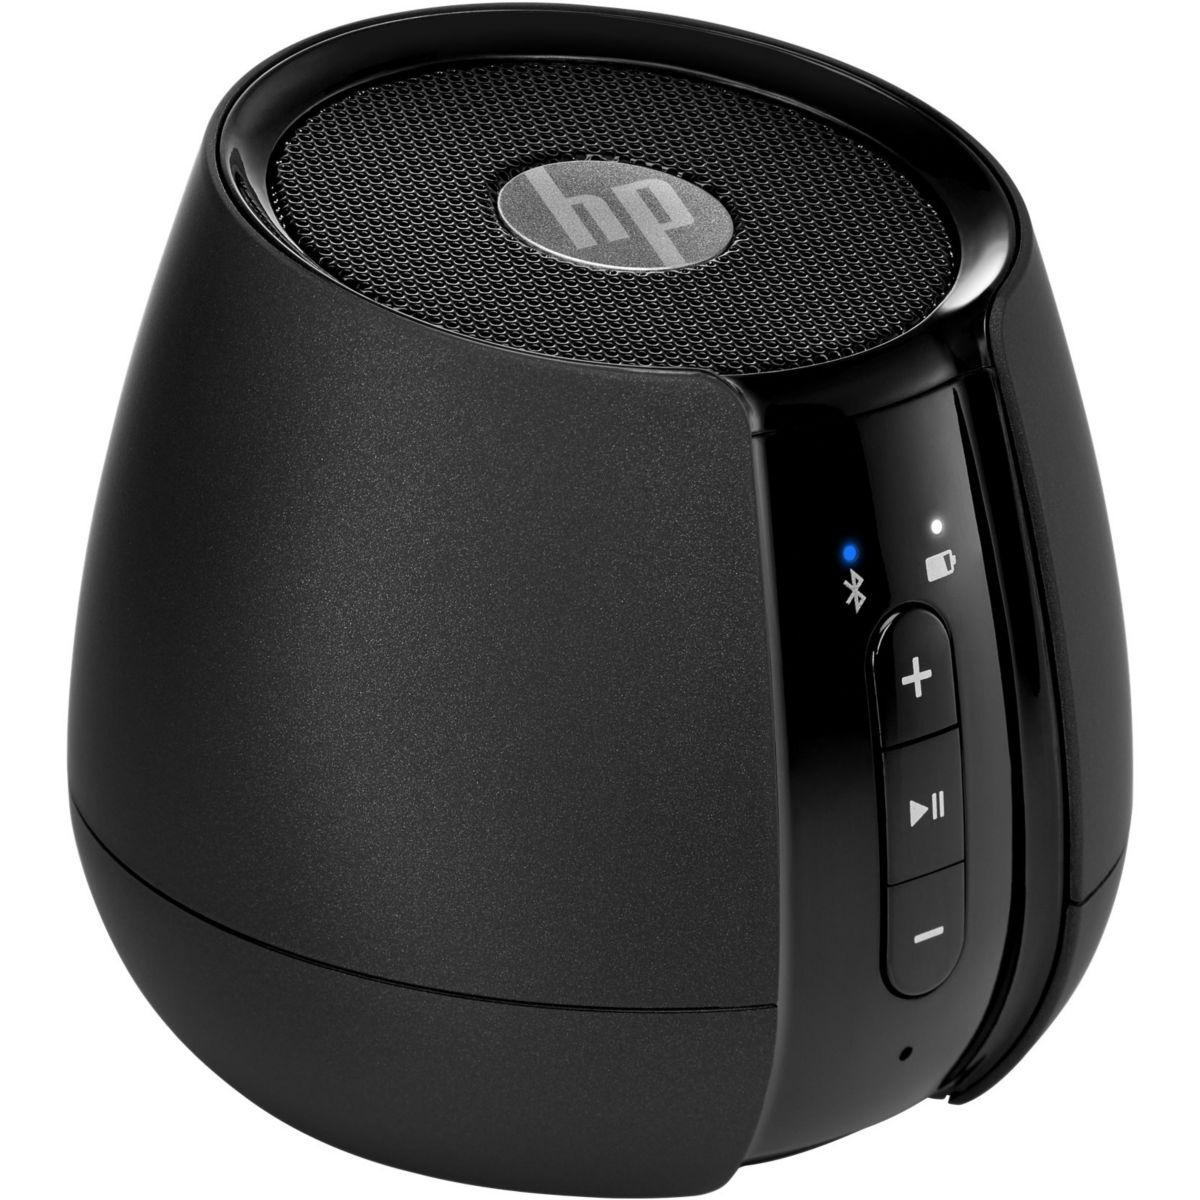 Enceinte pc hp black bt wireless speaker - 2% de remise imm�diate avec le code : deal2 (photo)